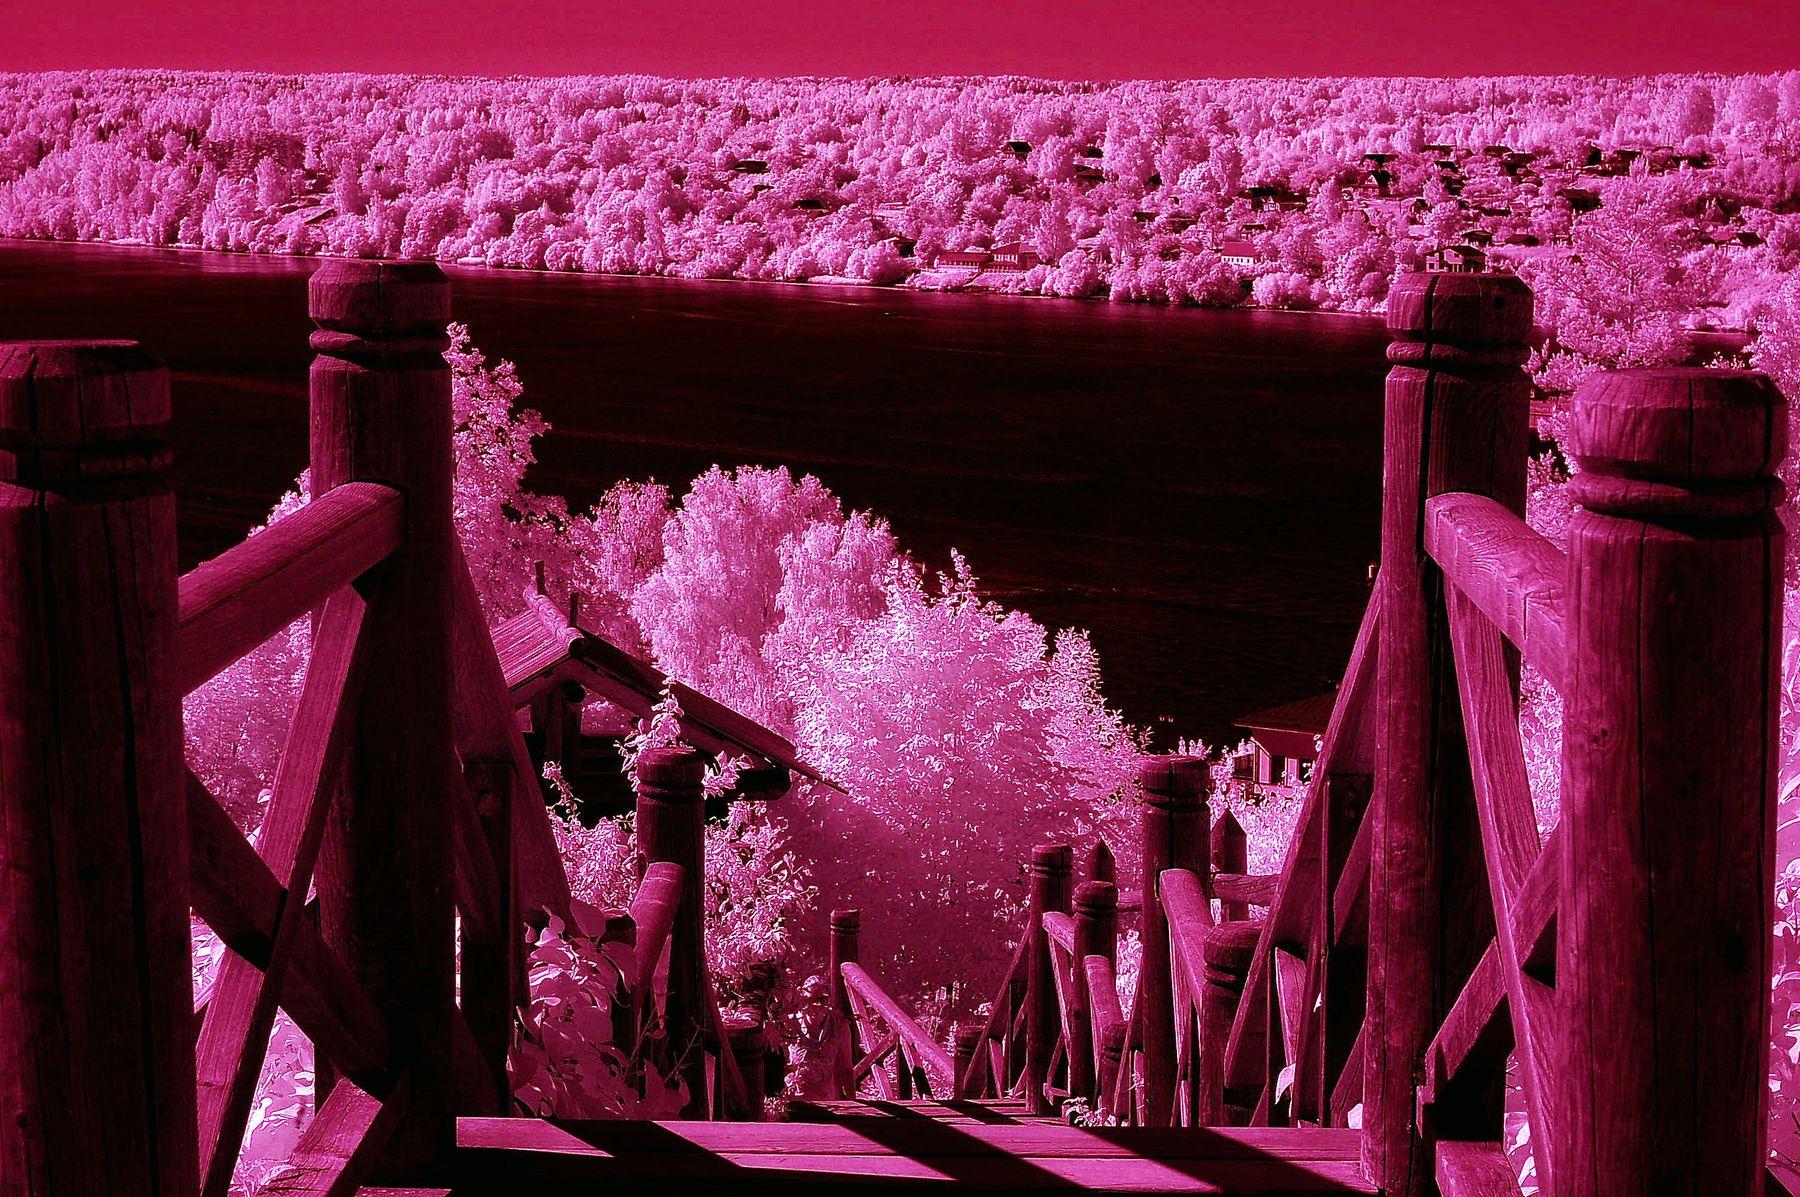 Плёс.К Волге.2021г. от Р.Х. Инфракрасная,чёрно-белая,монохромная, фотография.   infrared-photo@yandex.ru Инфракрасная чёрно-белая монохромная фотография infrared imaging infrared-photo yandex.ru